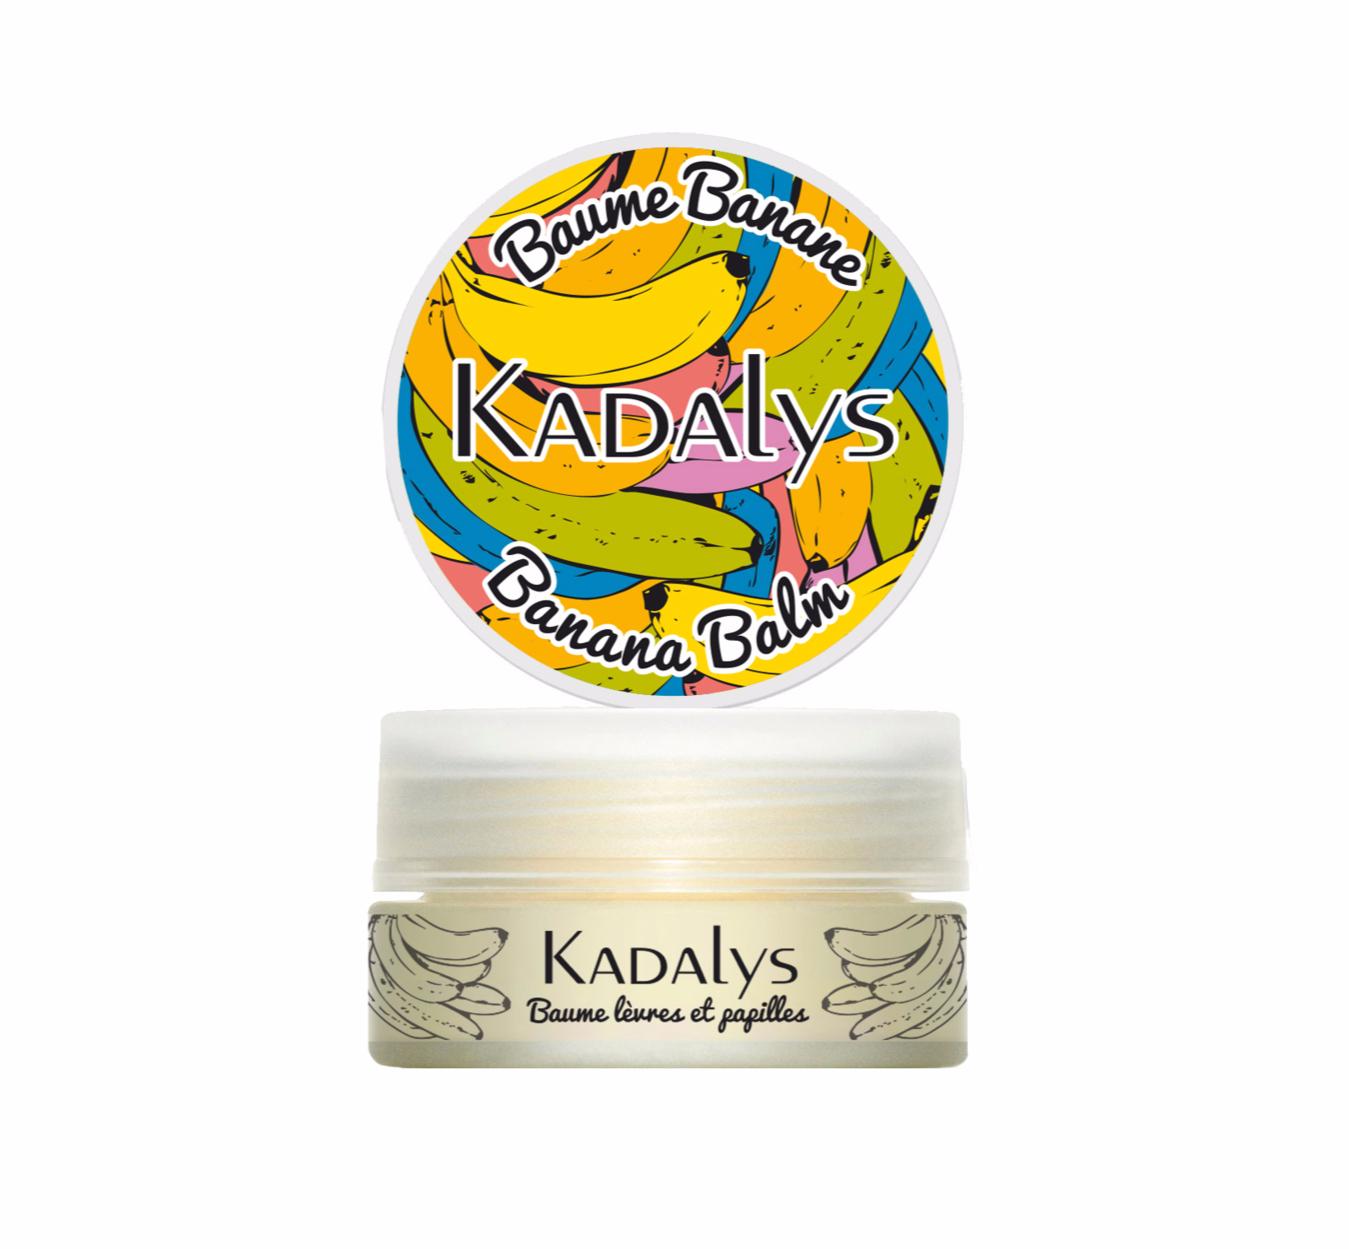 Kadalys-Baume